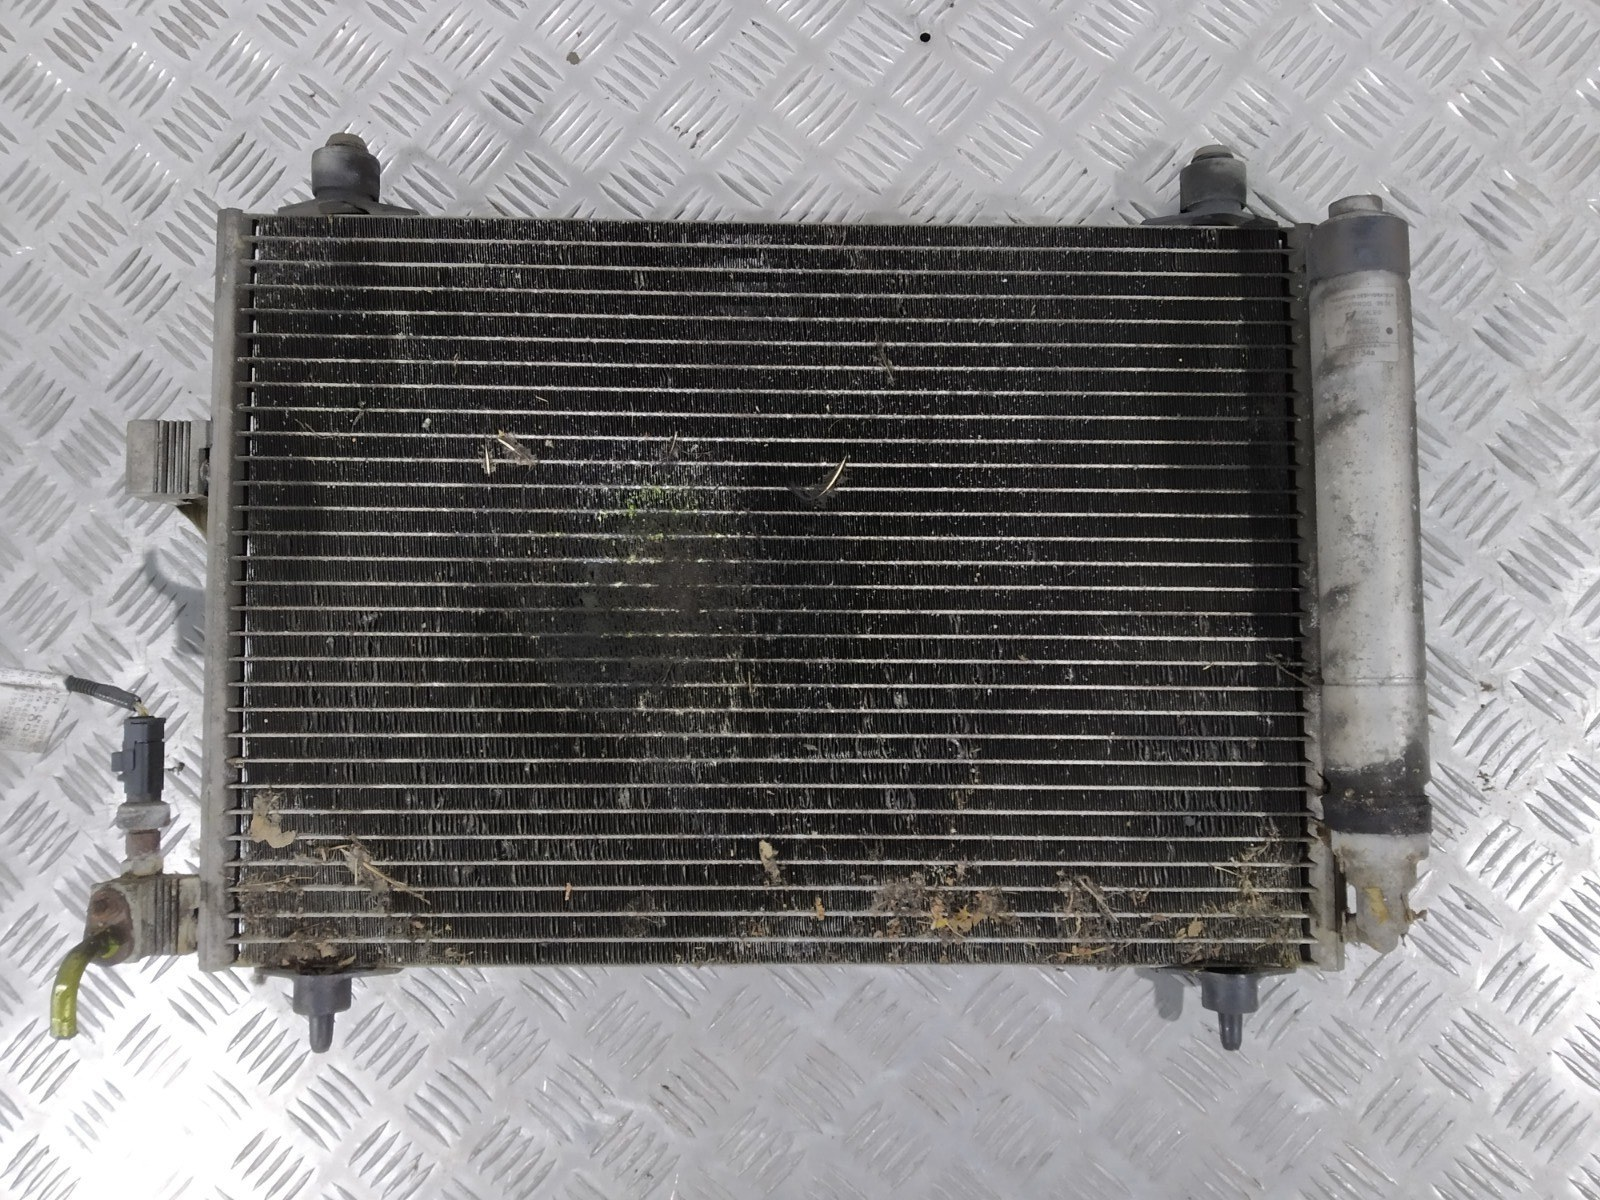 Радиатор кондиционера Citroen C5 2.0 HDI 2006 (б/у)